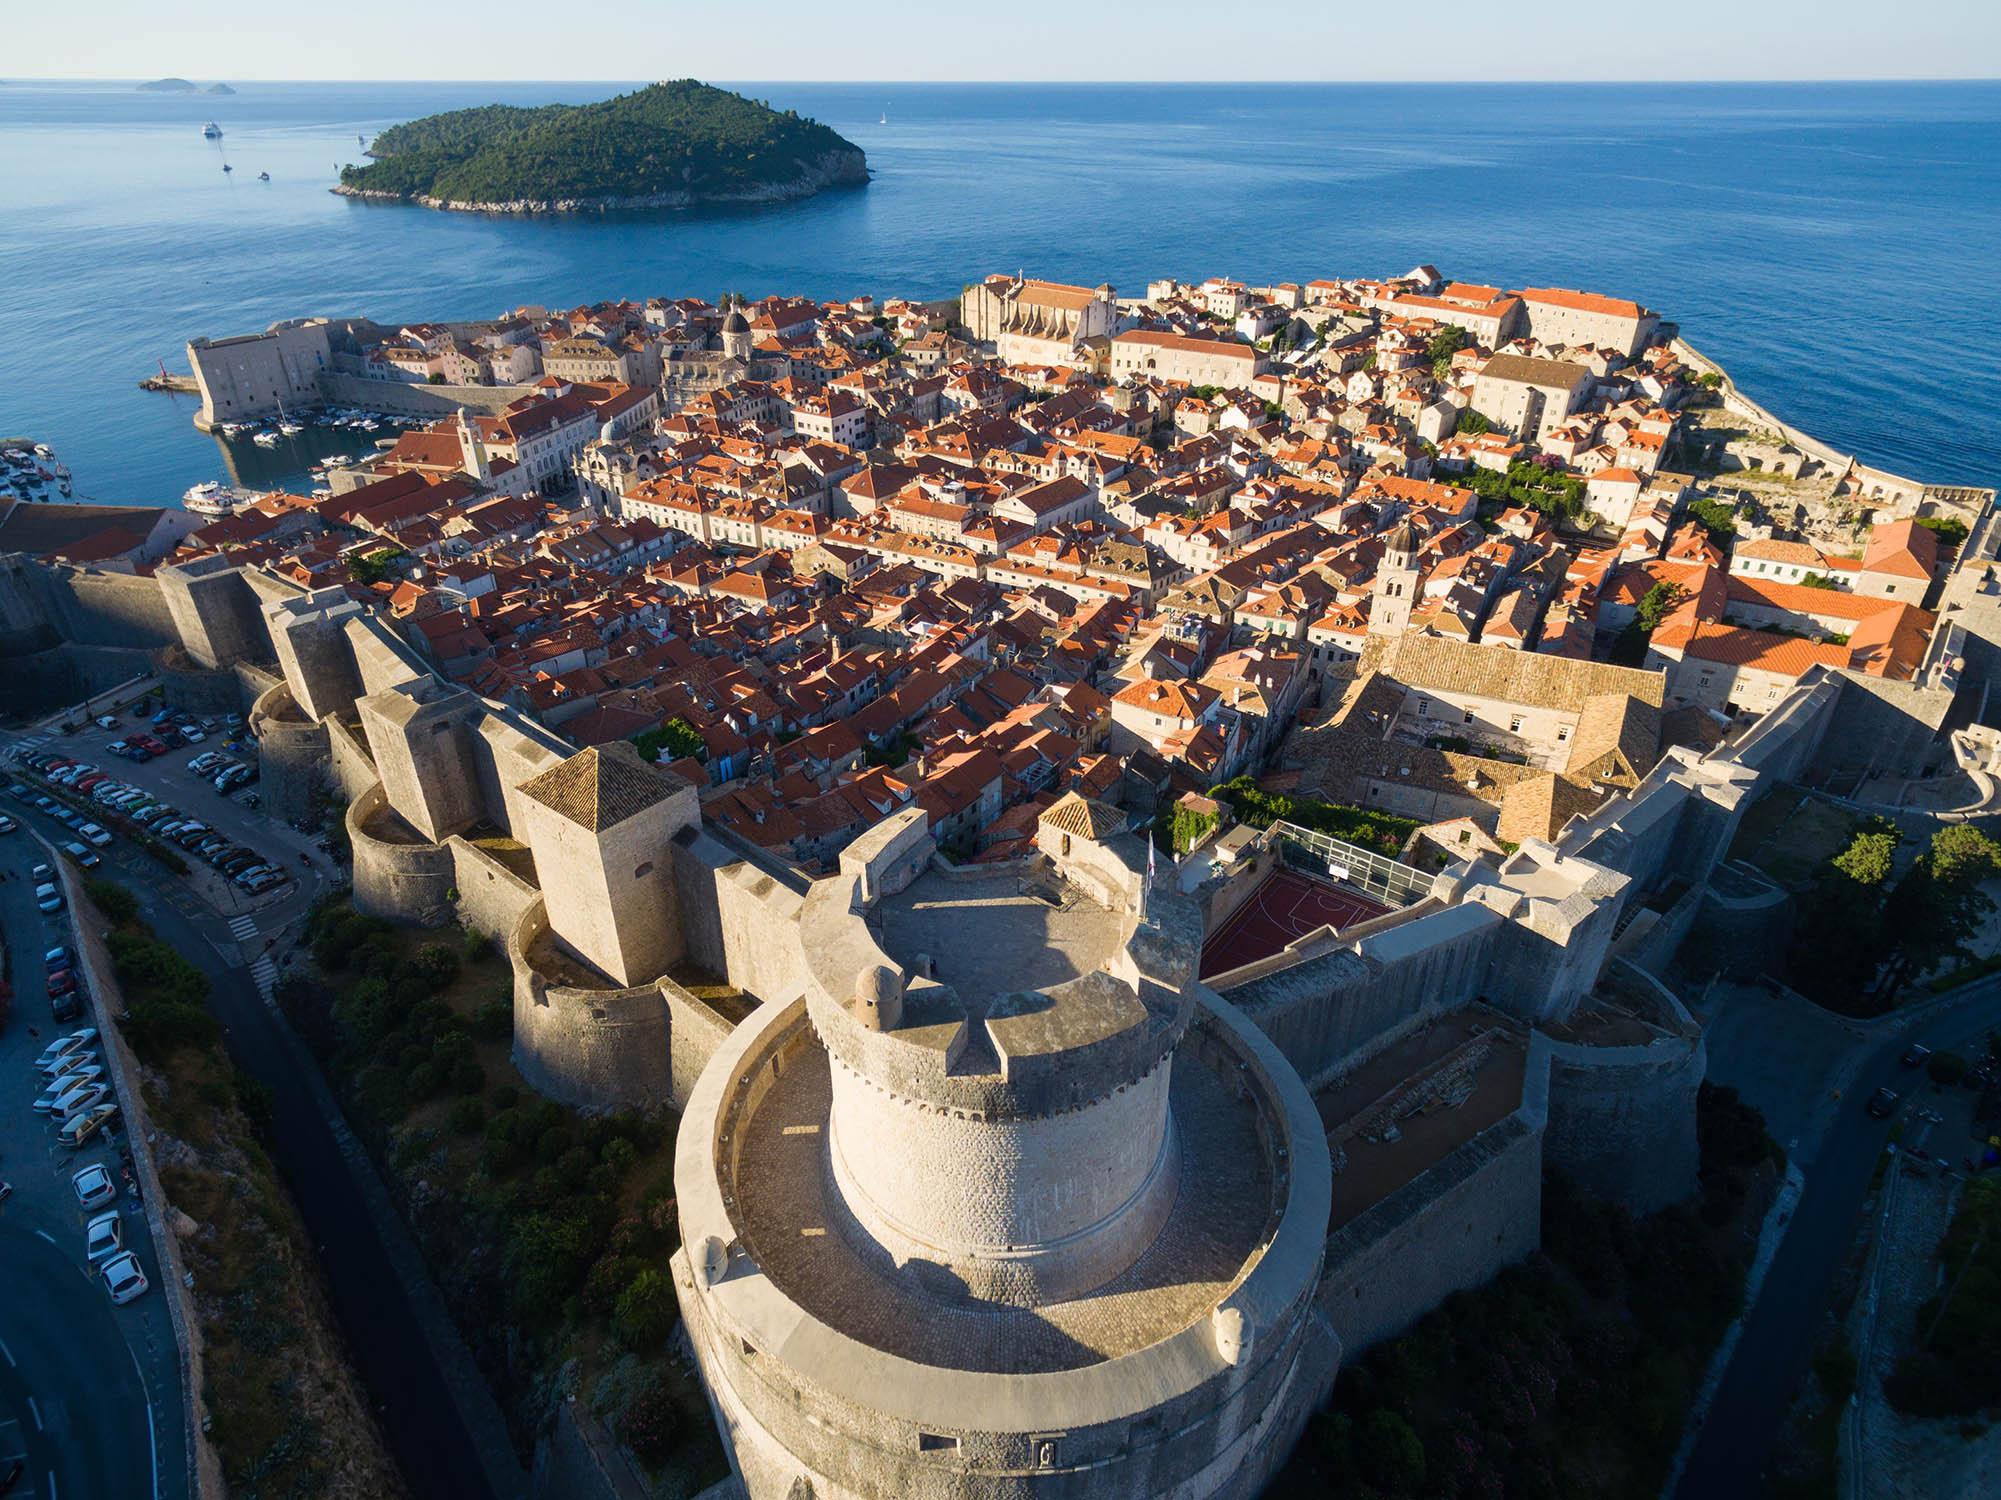 Aerial image of Dubrovnik and Lokrum